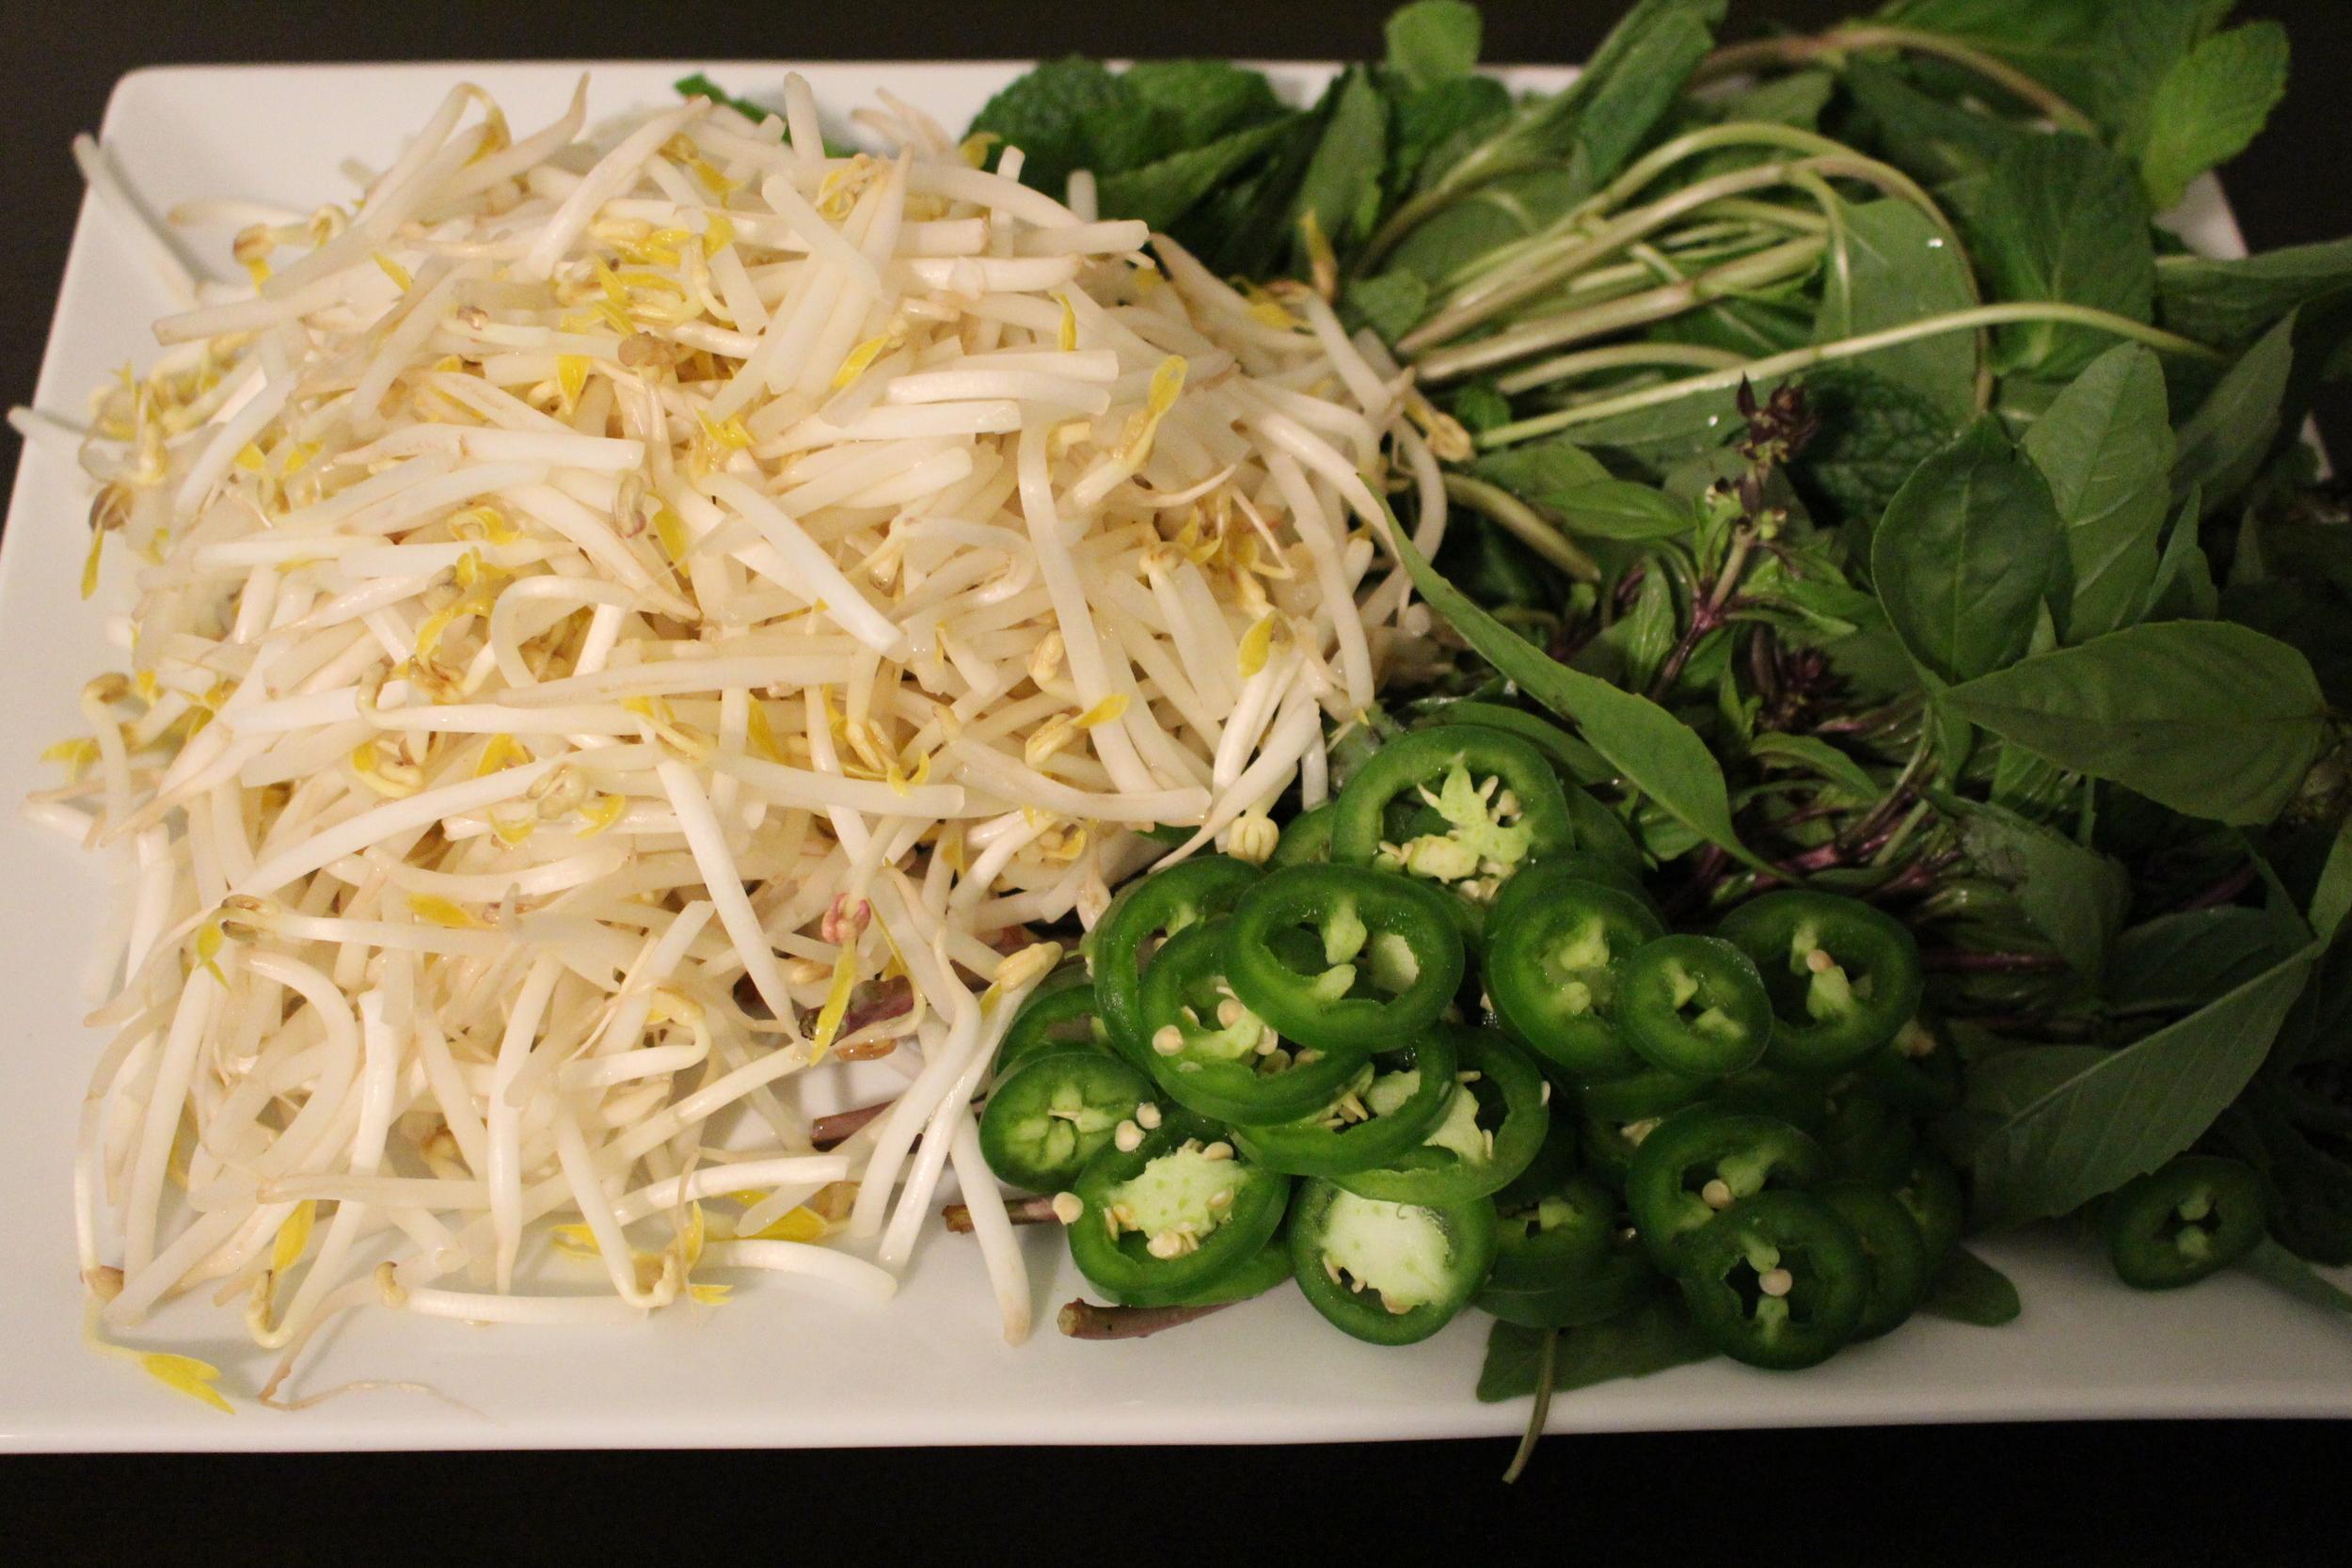 Basil, mint leaves, mung beans, sereno pepper